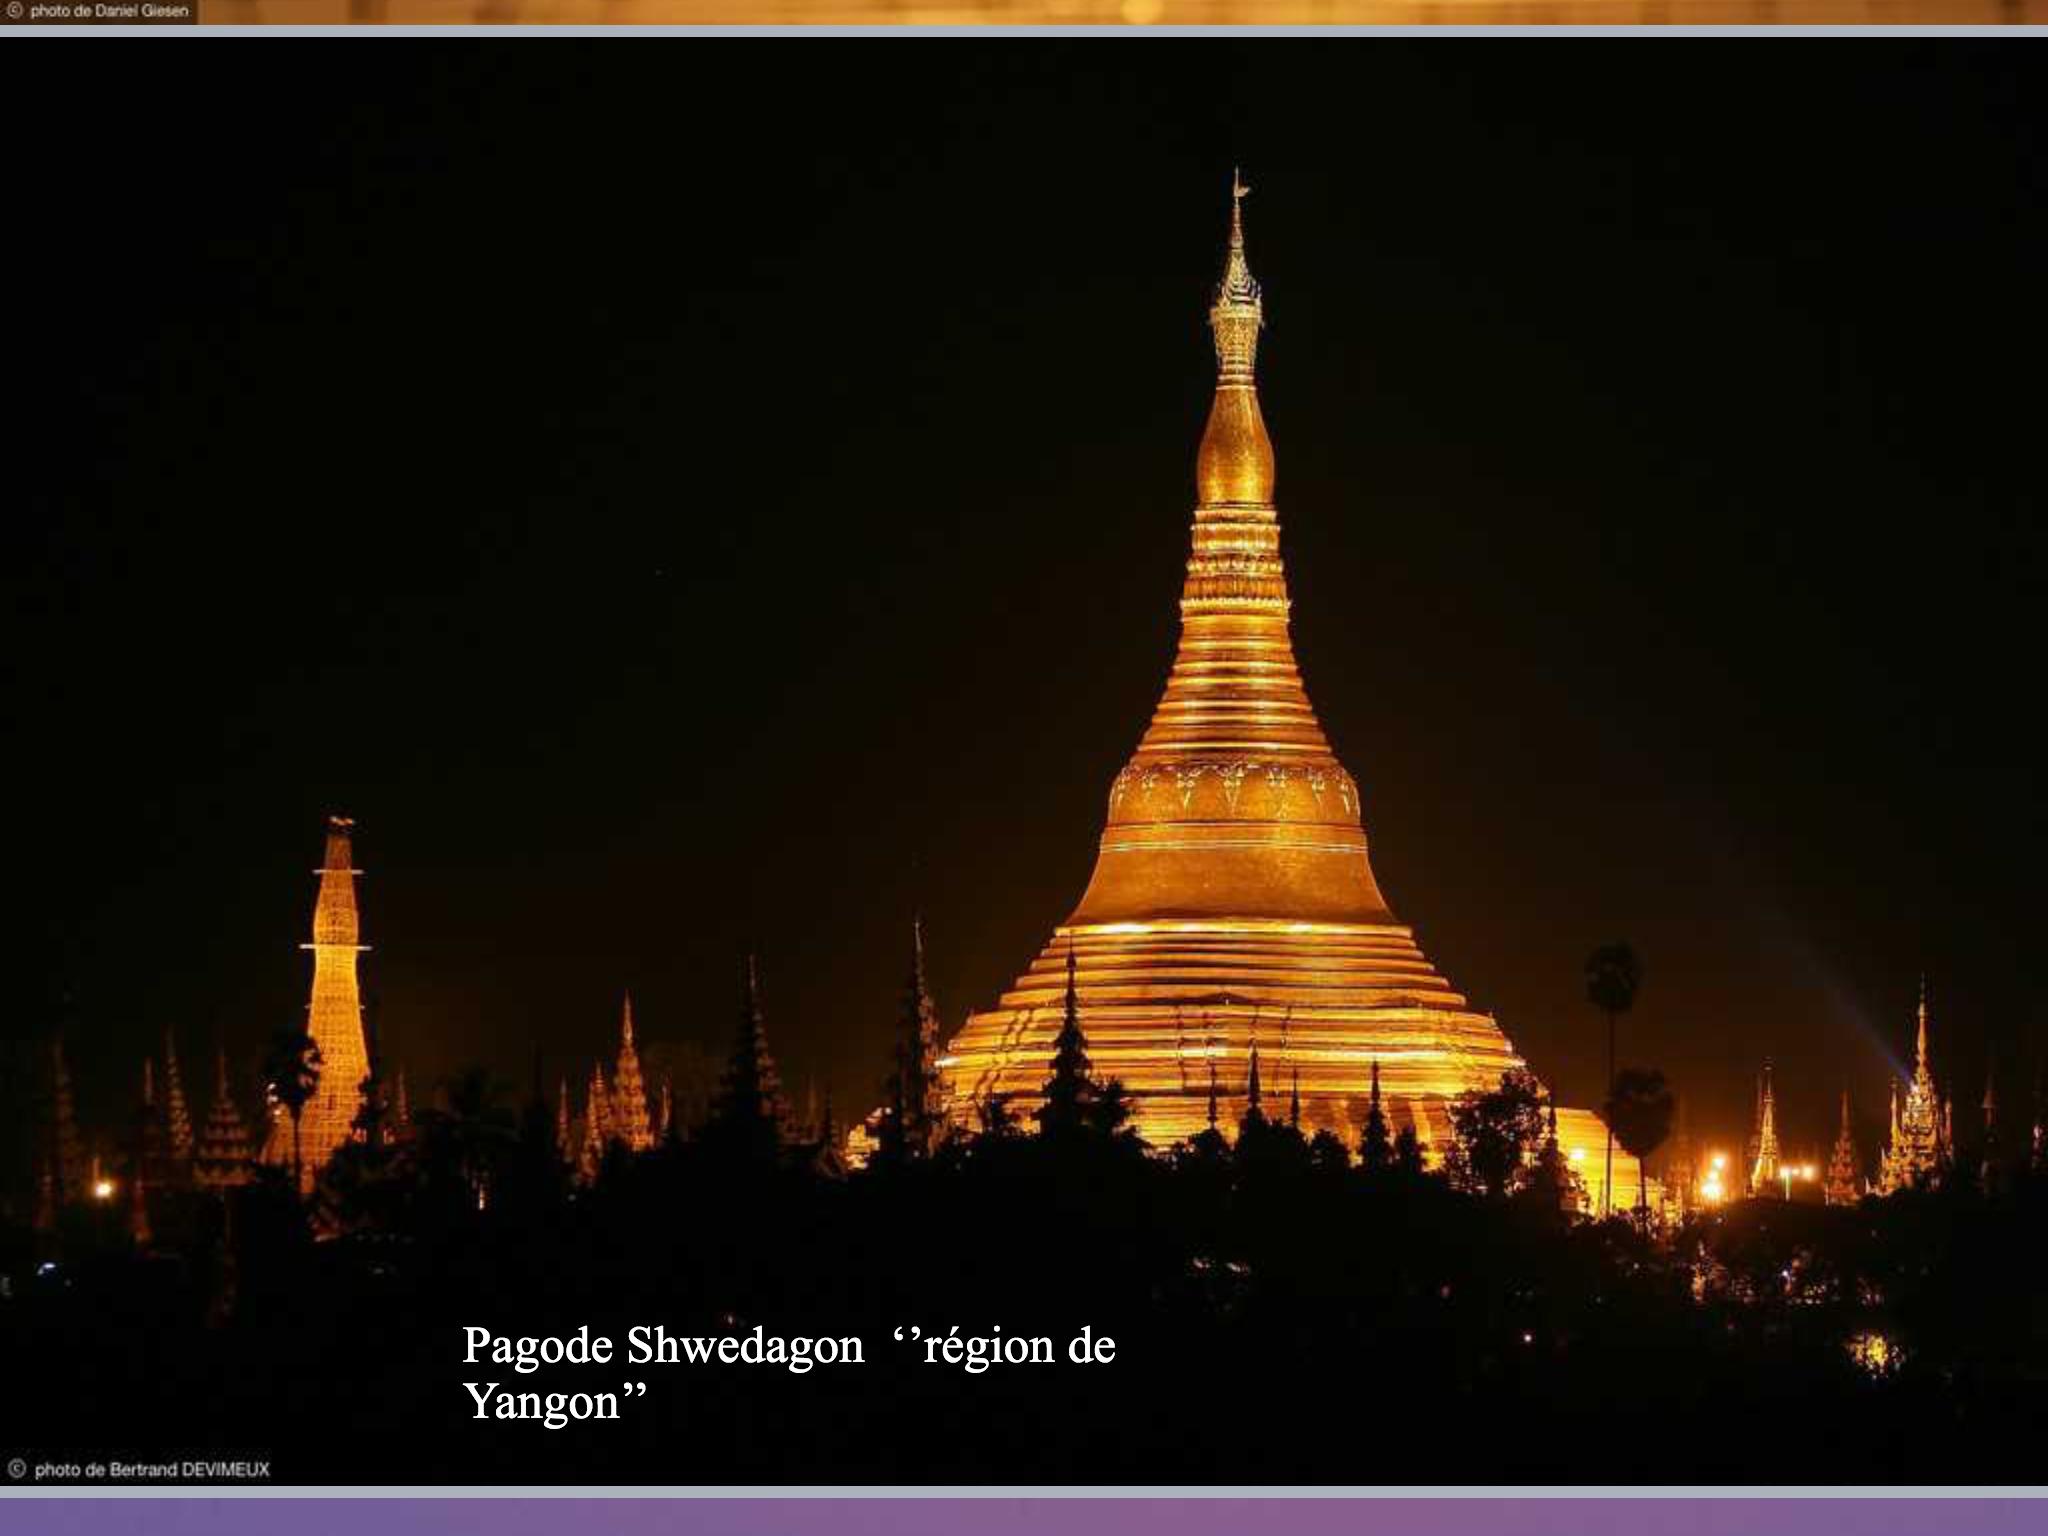 Pagode Shwedagon, Région de yagon